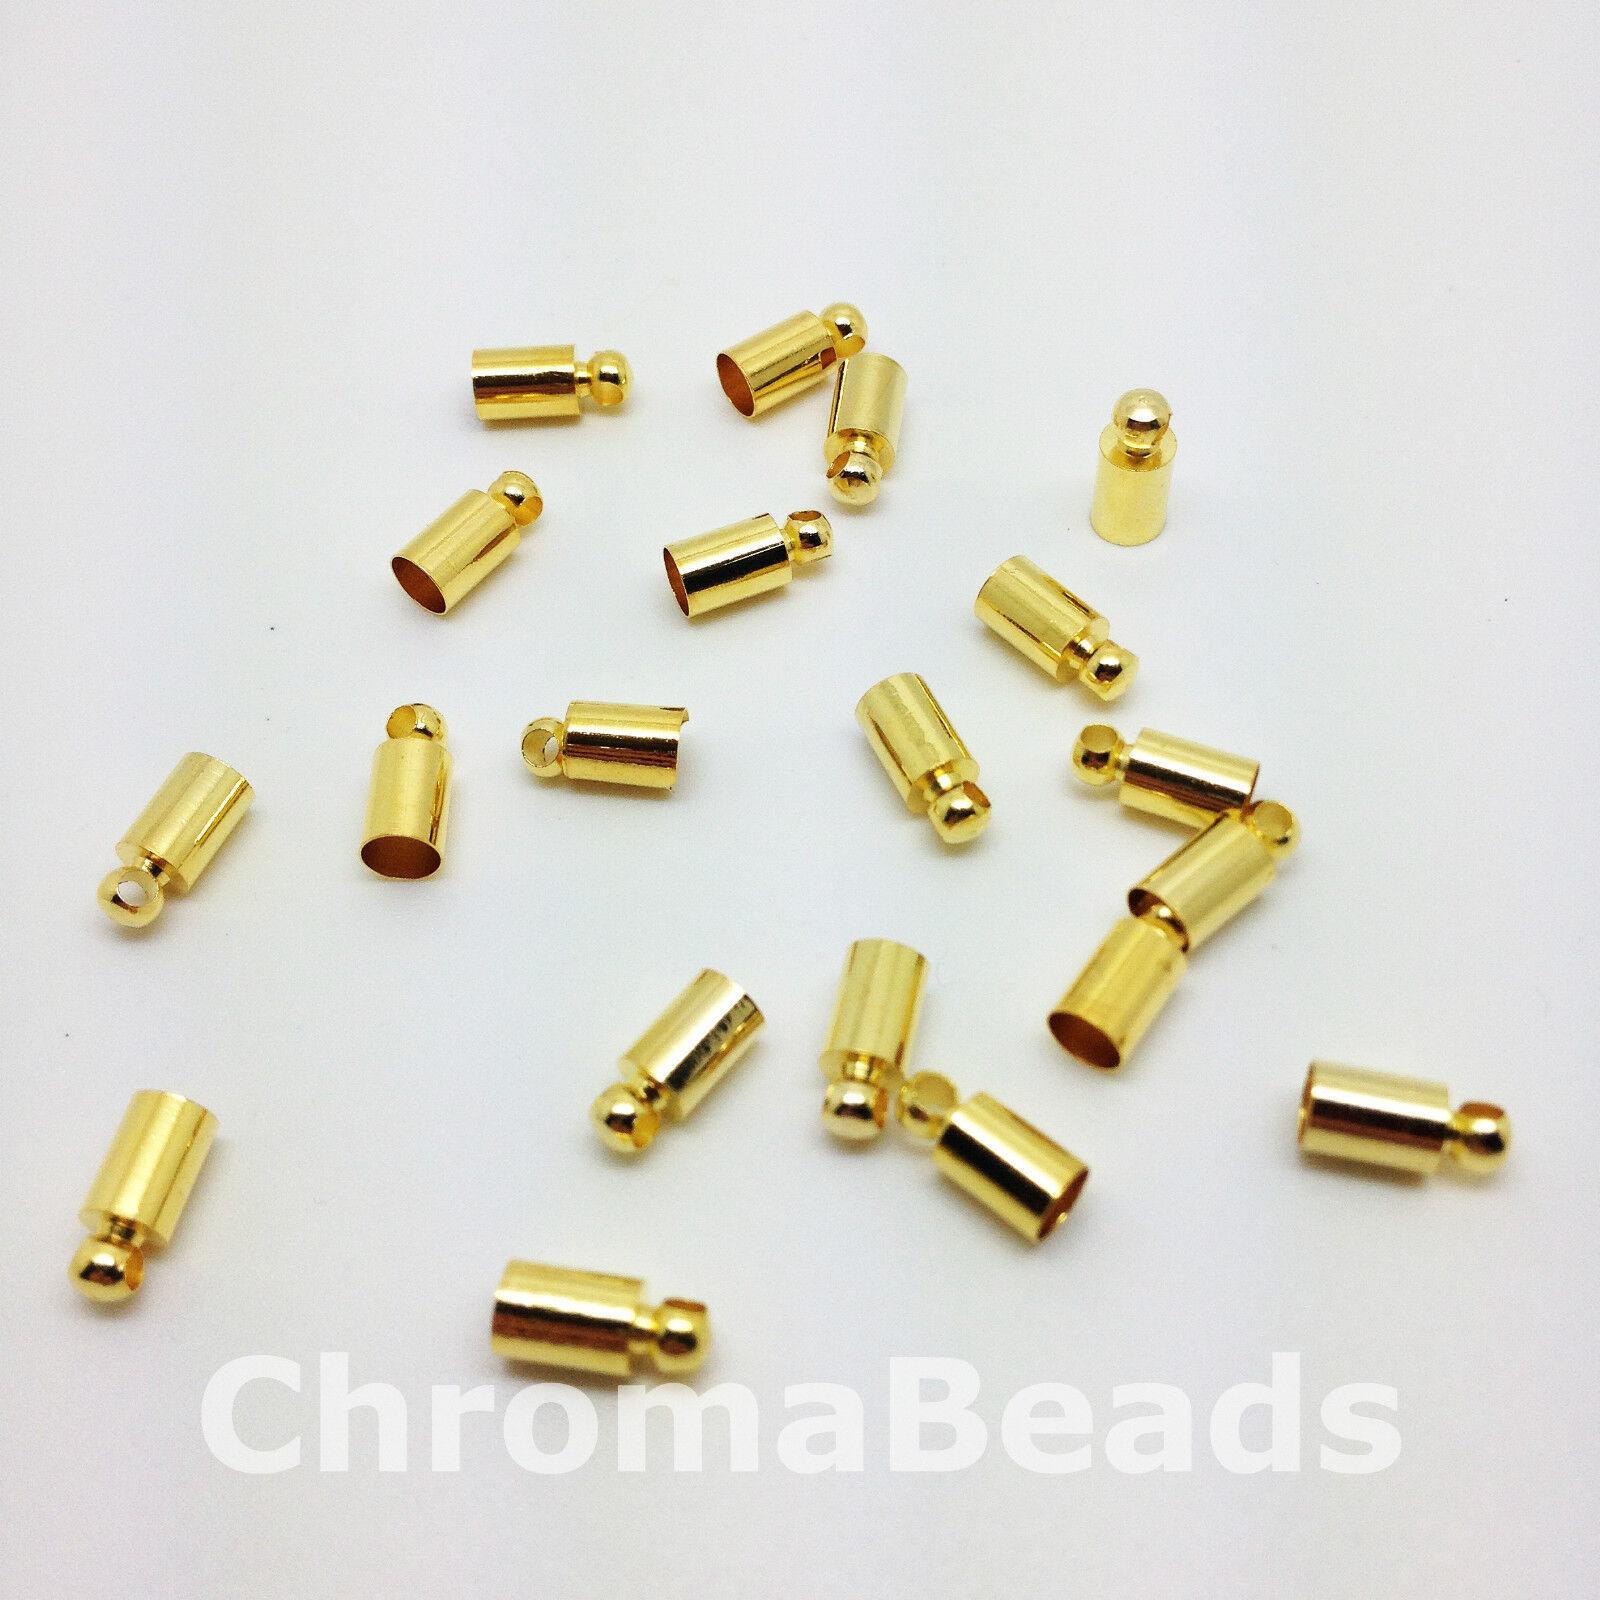 Packet 20 x Platinum Plated Brass Barrel End Caps 8 x 12mm HA07570